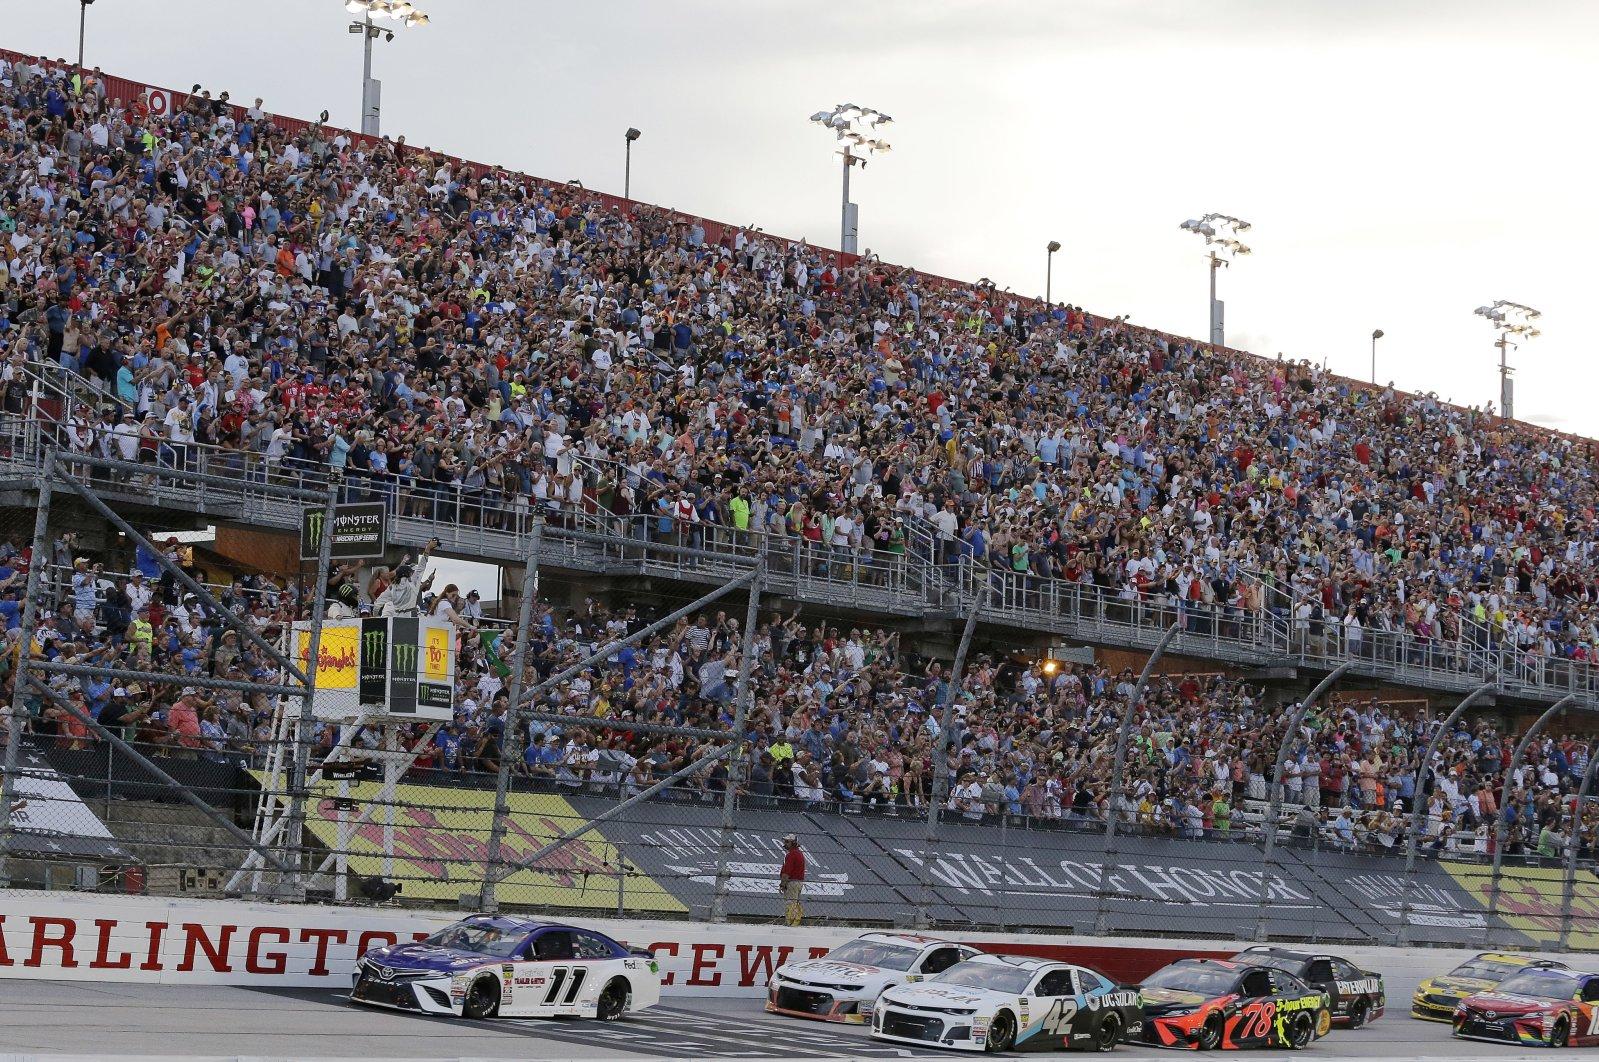 Denny Hamlin (11) leads the pack to start the NASCAR Cup Series auto race at Darlington Raceway in Darlington, U.S., Sept. 2, 2018. (AP Photo)